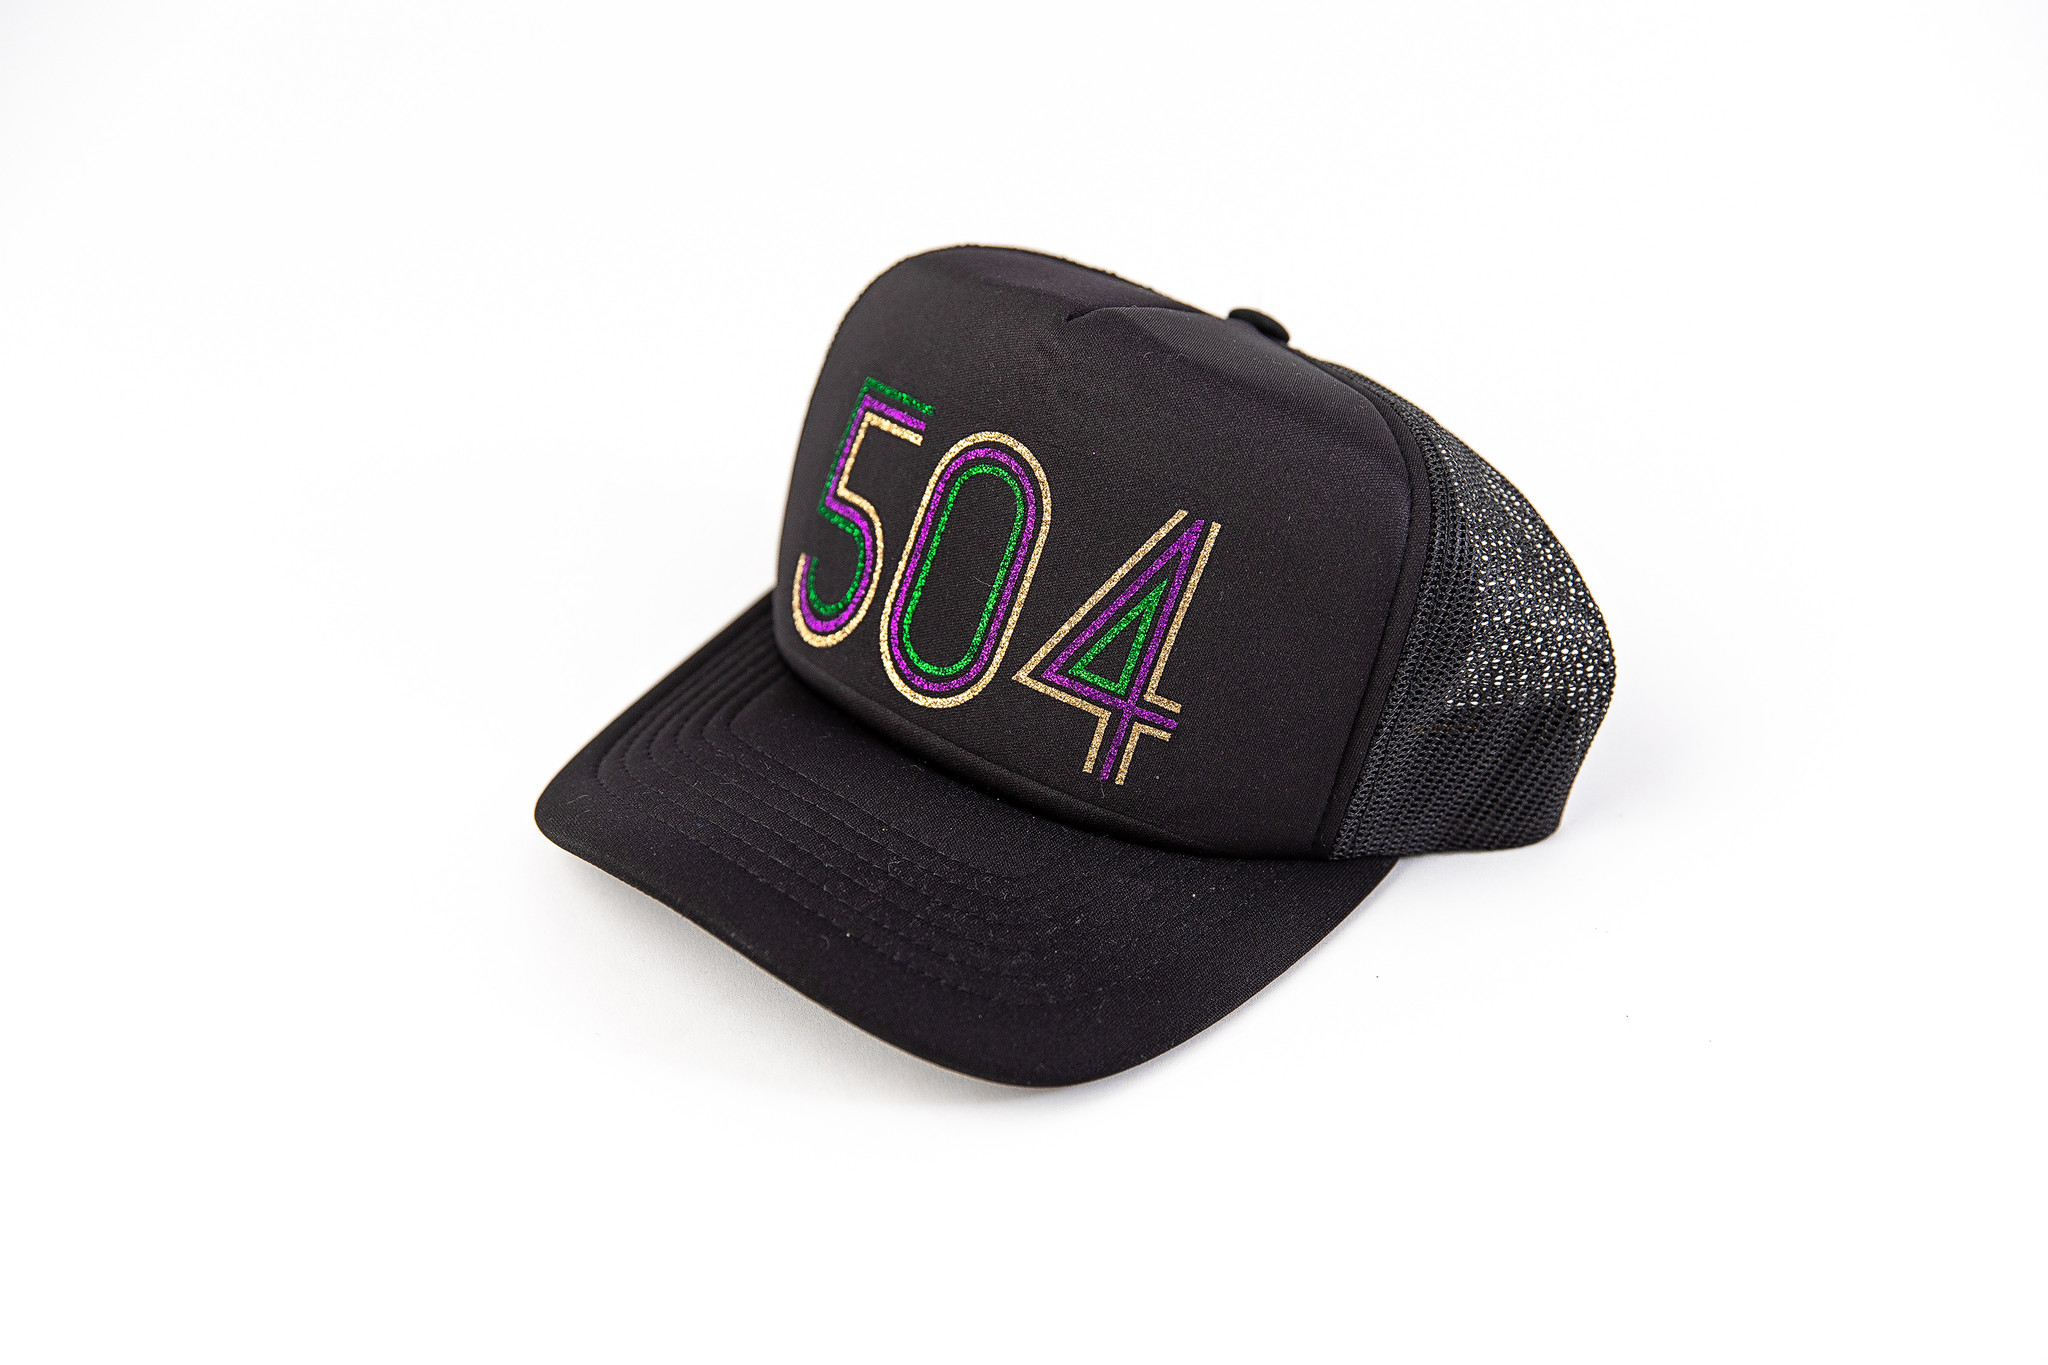 Mardi Gras 504 Glitter Trucker Hat